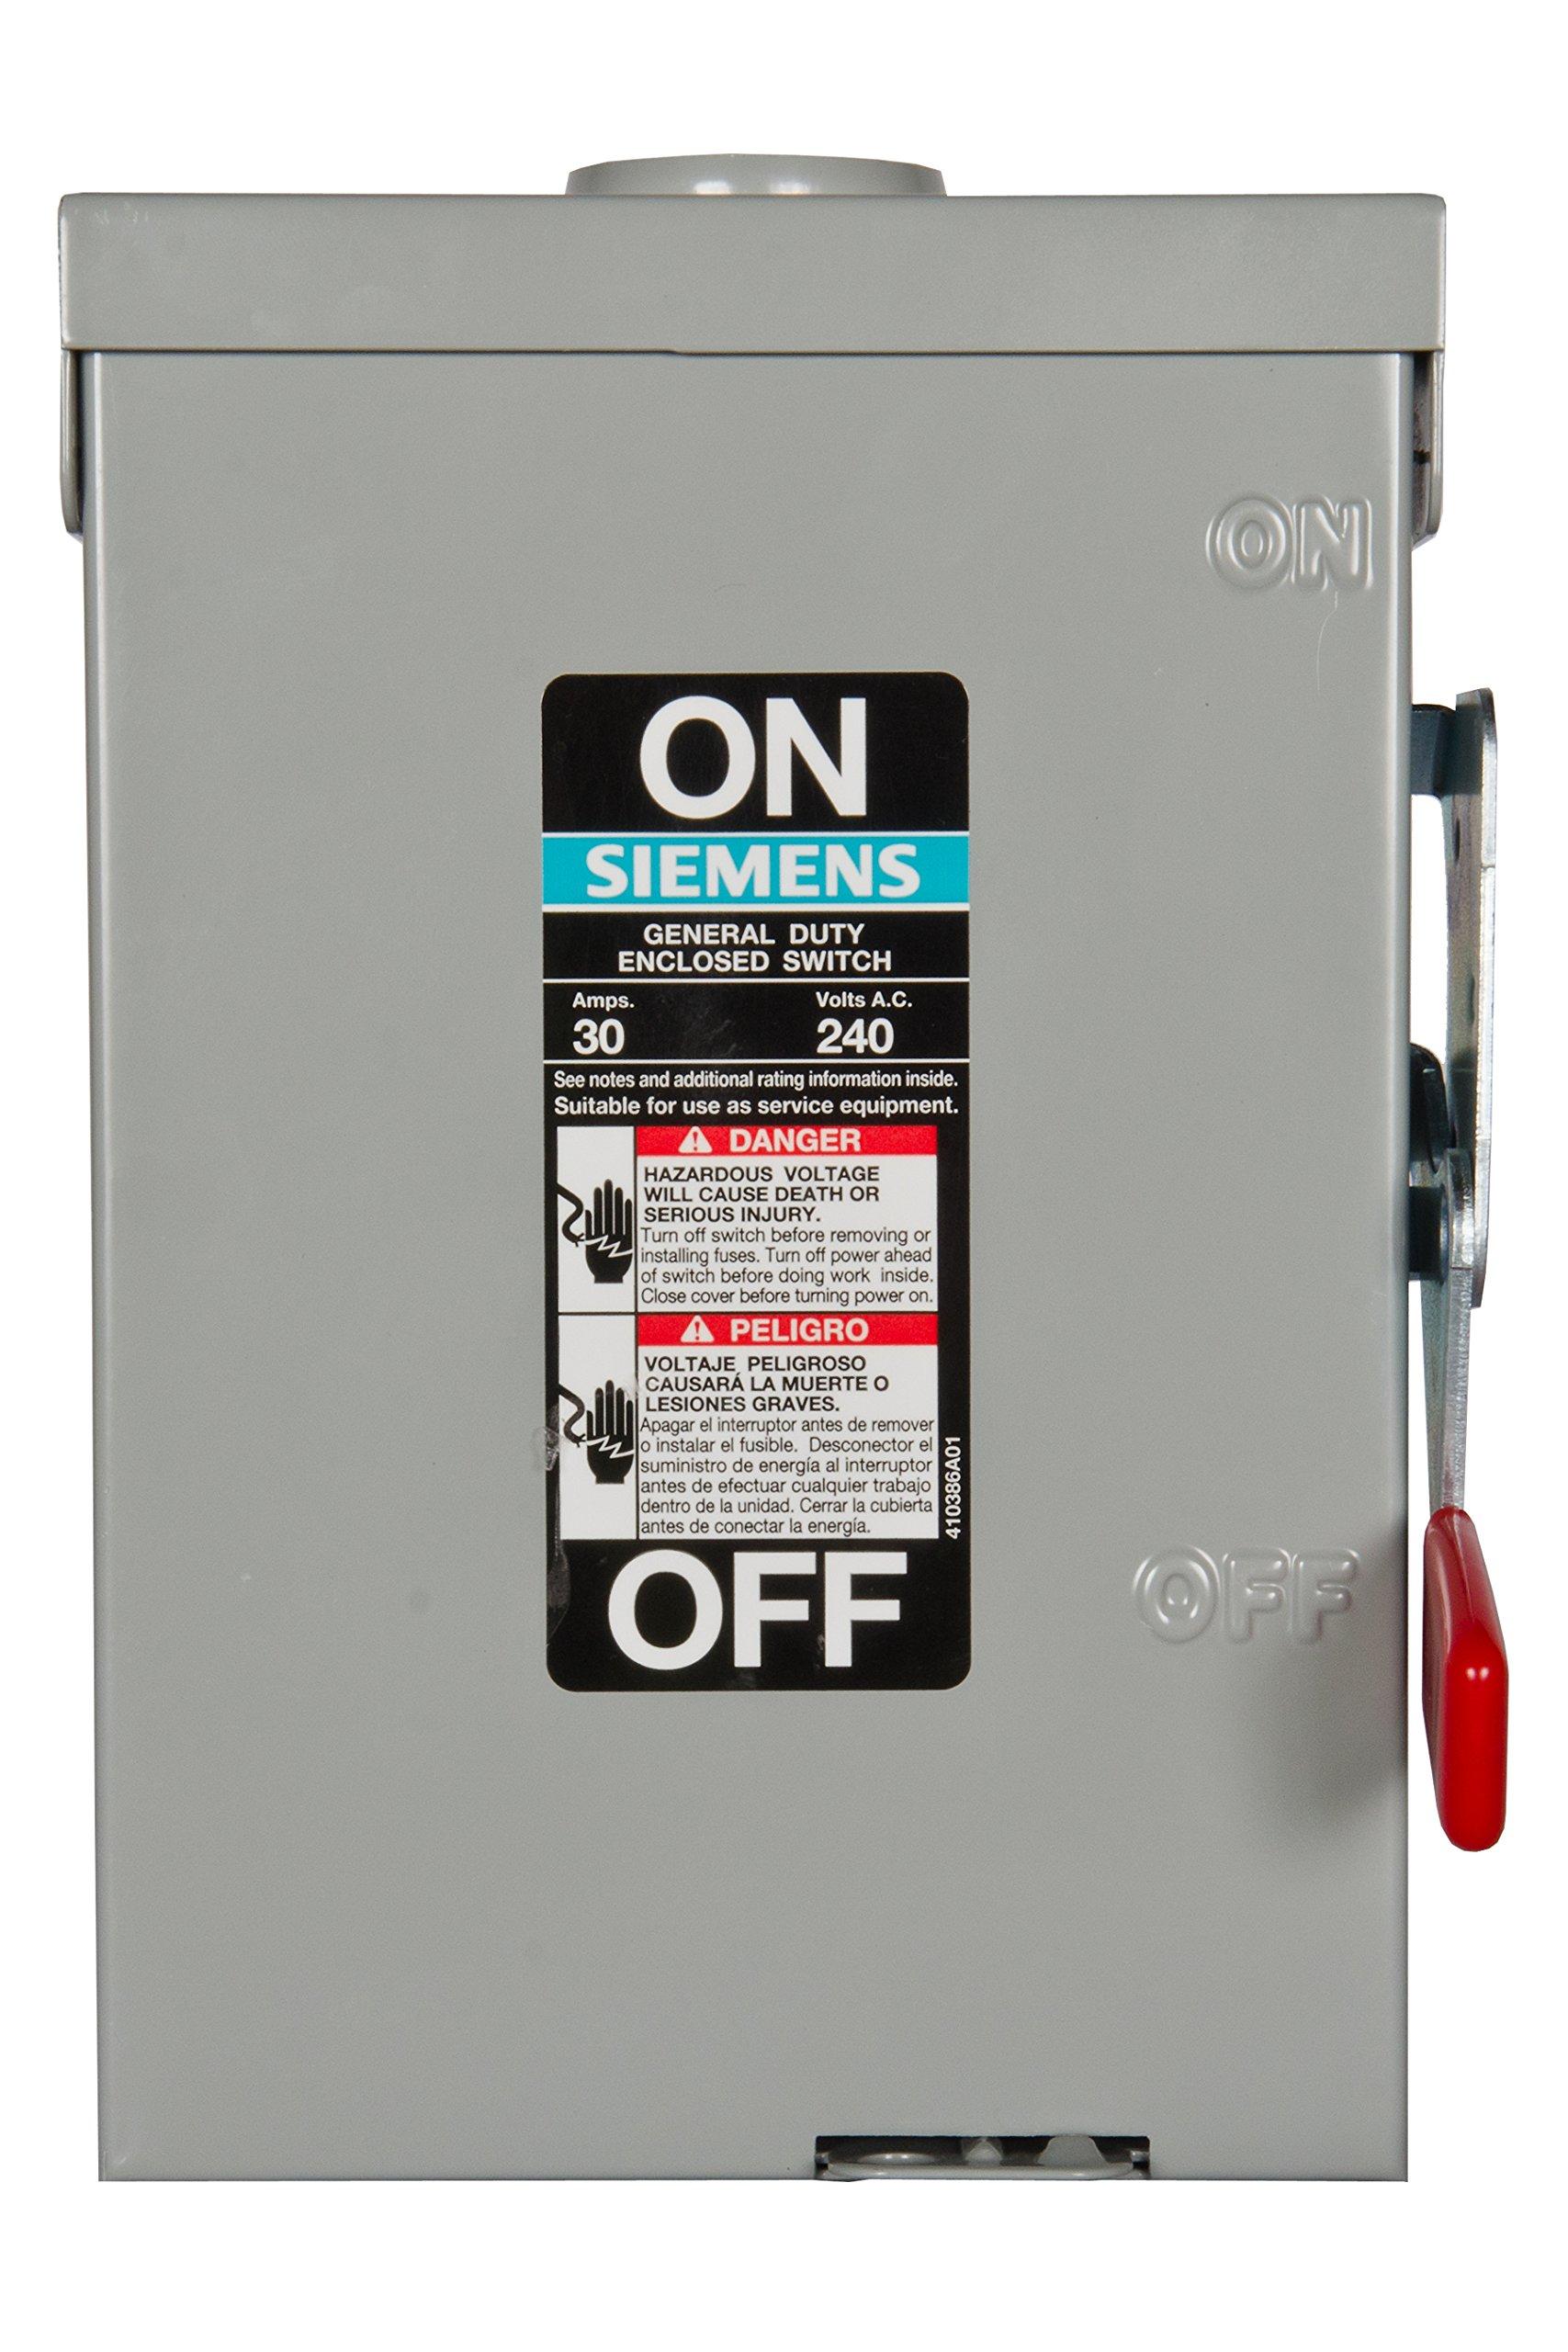 Siemens GF221NR 30-Amp 2 Pole 240-volt Fused W/N Type 3R General Duty Safety Switches